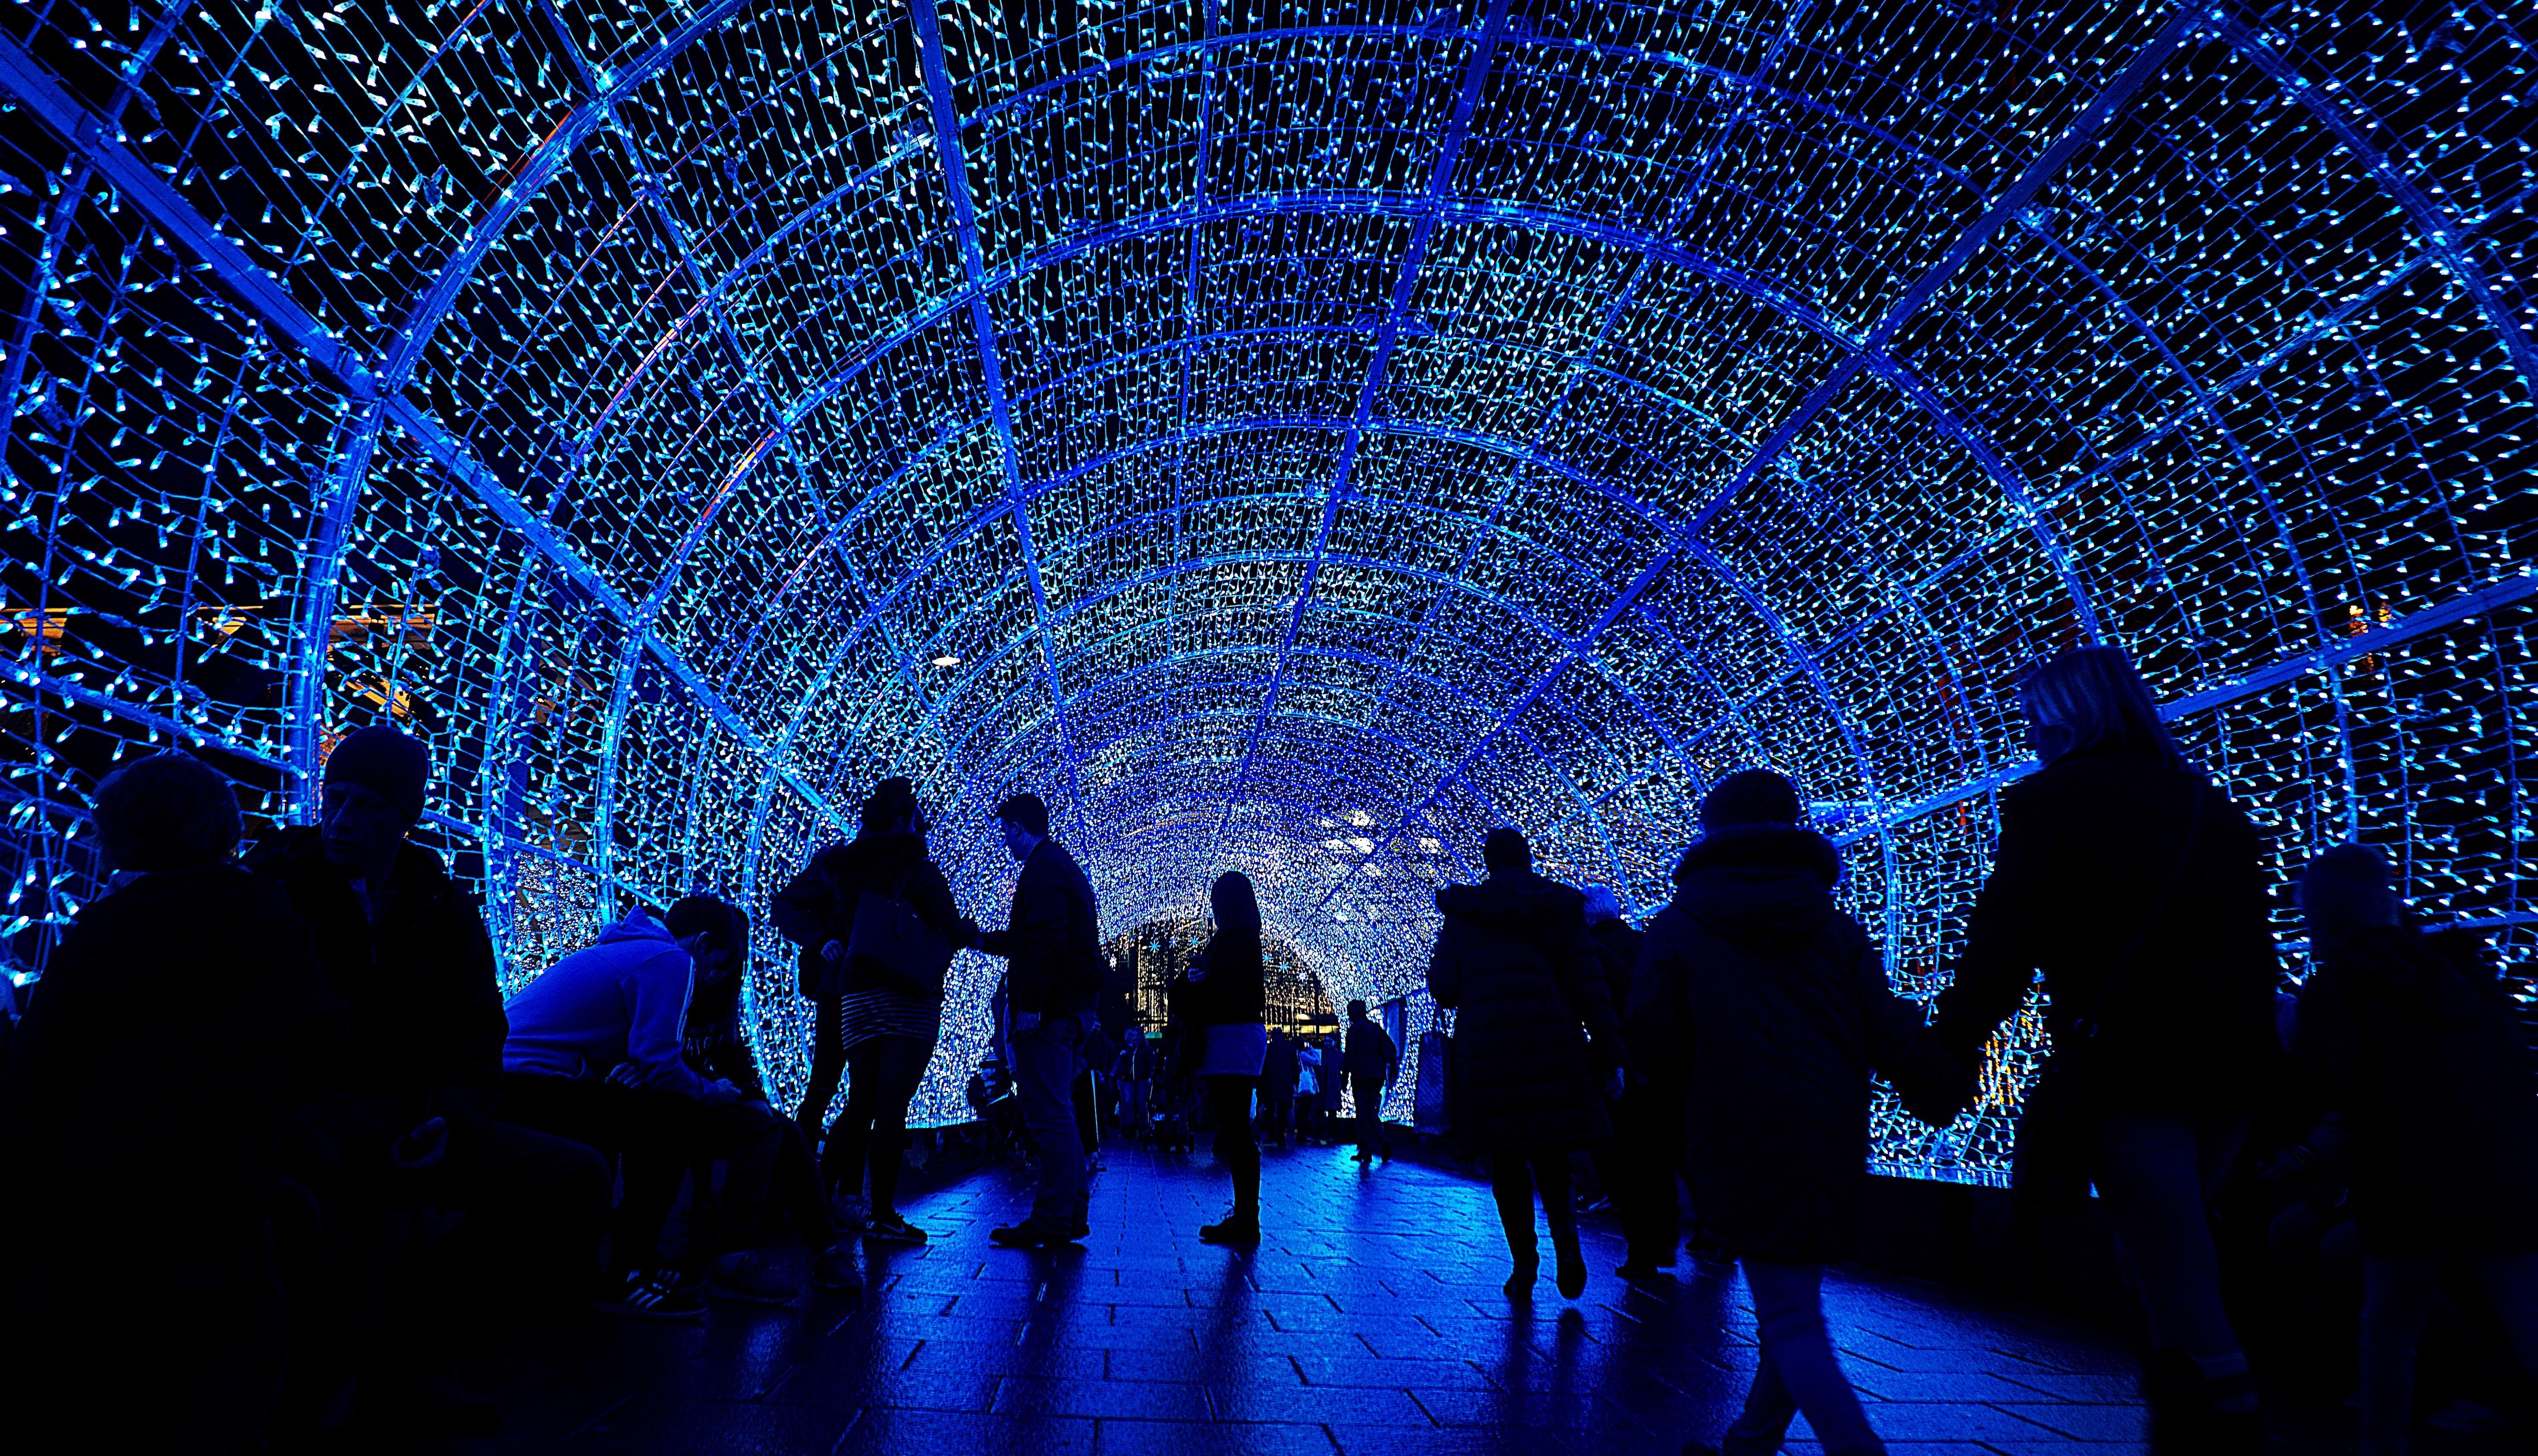 lights christmas street festive tunnel decorations xmas blue purple light lighting christmas lights darkness night tree